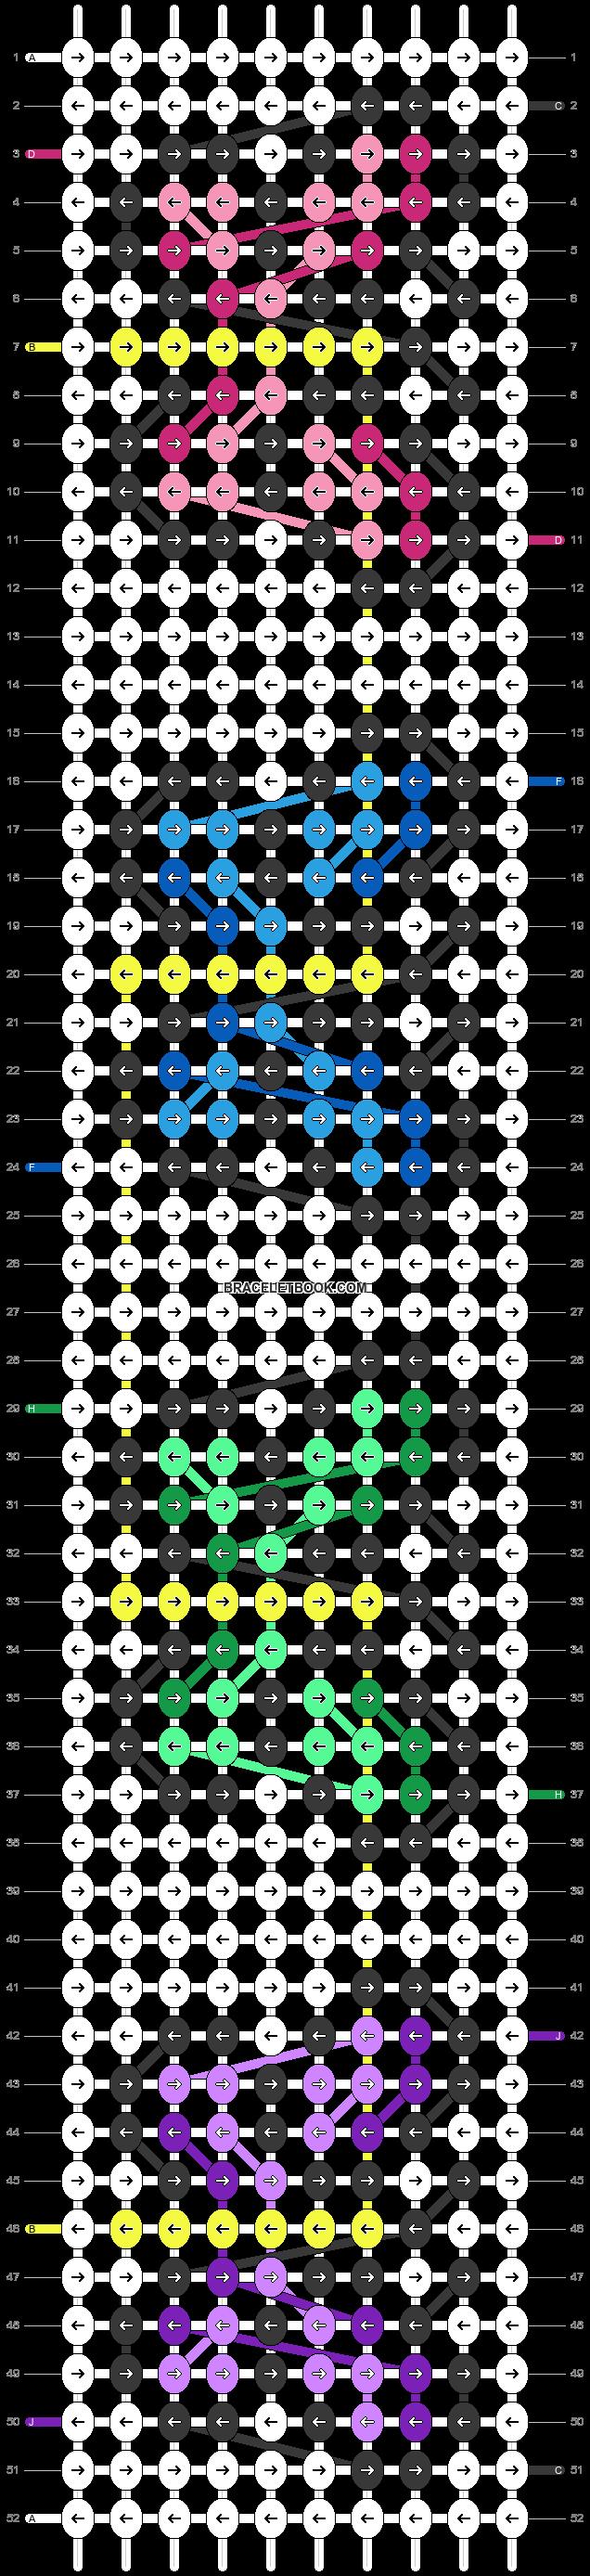 Alpha pattern #23685 pattern